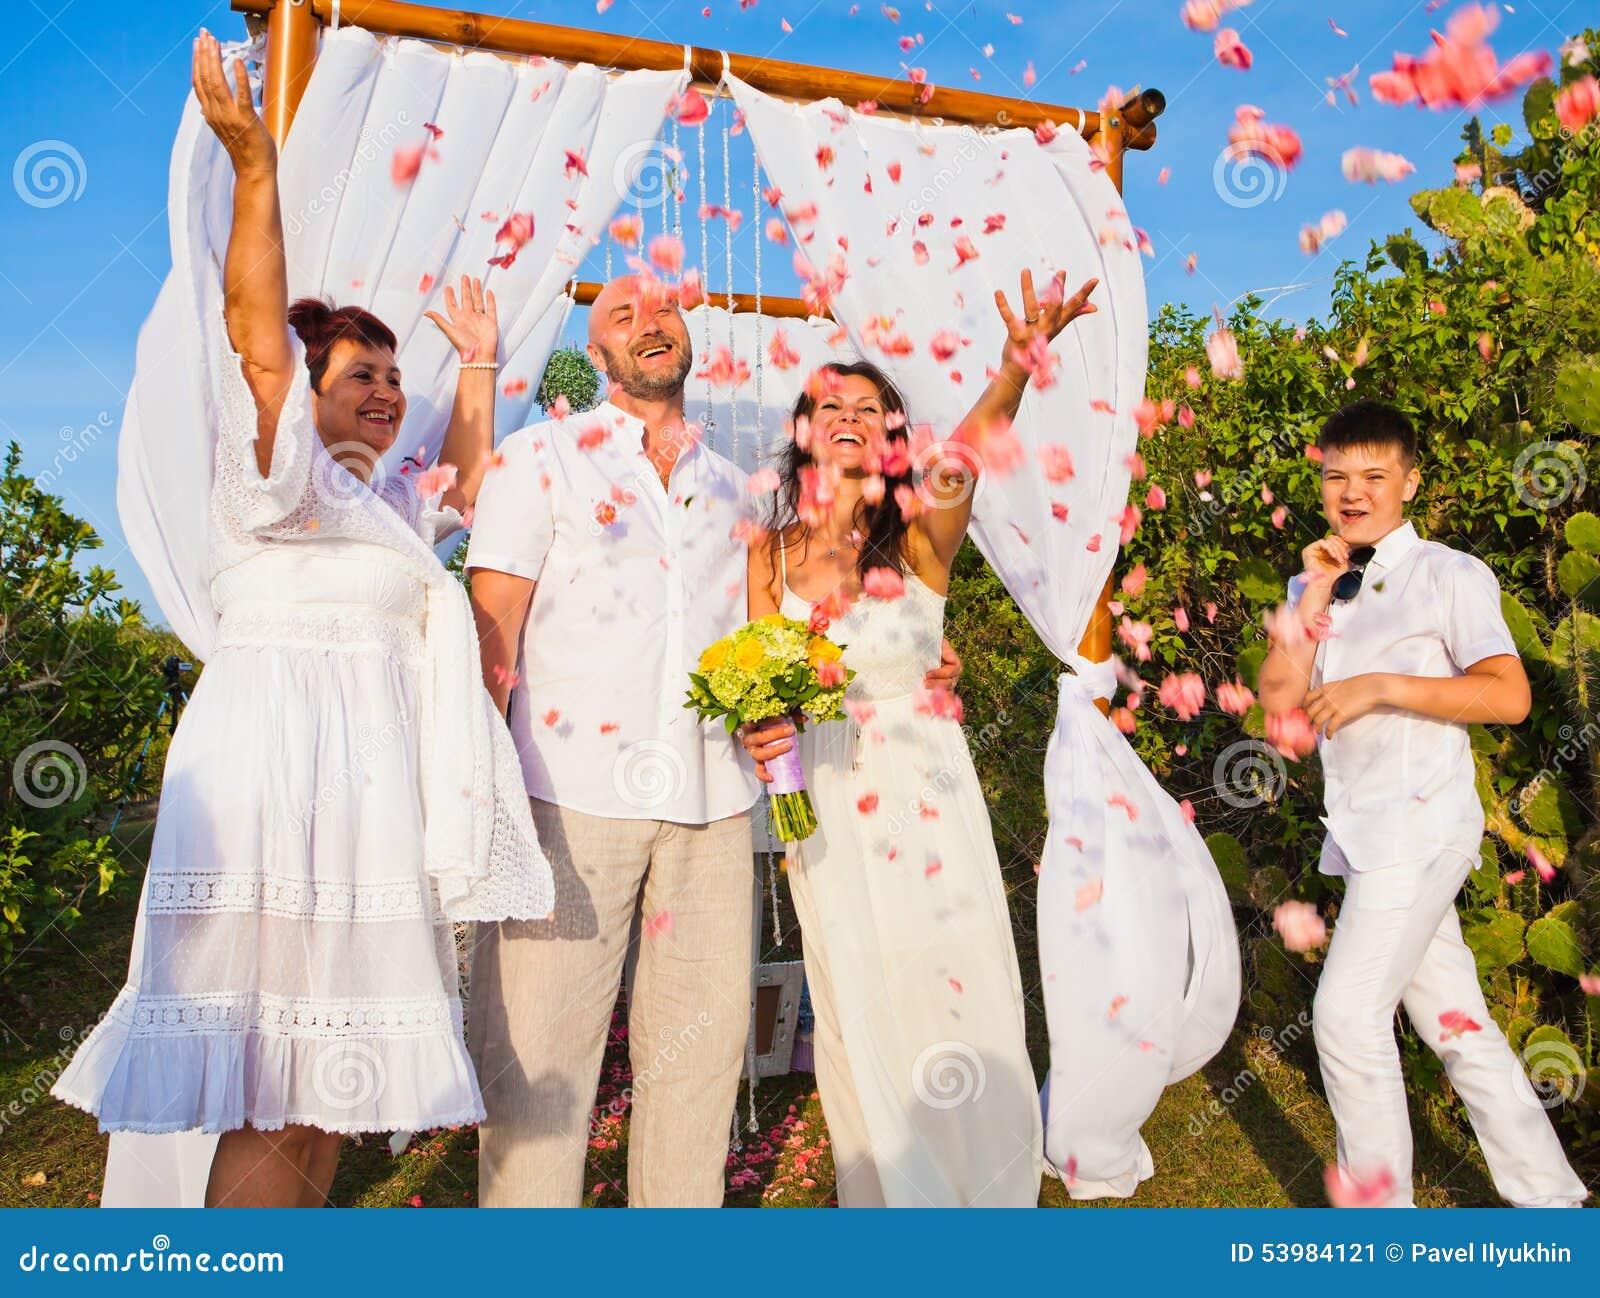 Mature couple wedding photos